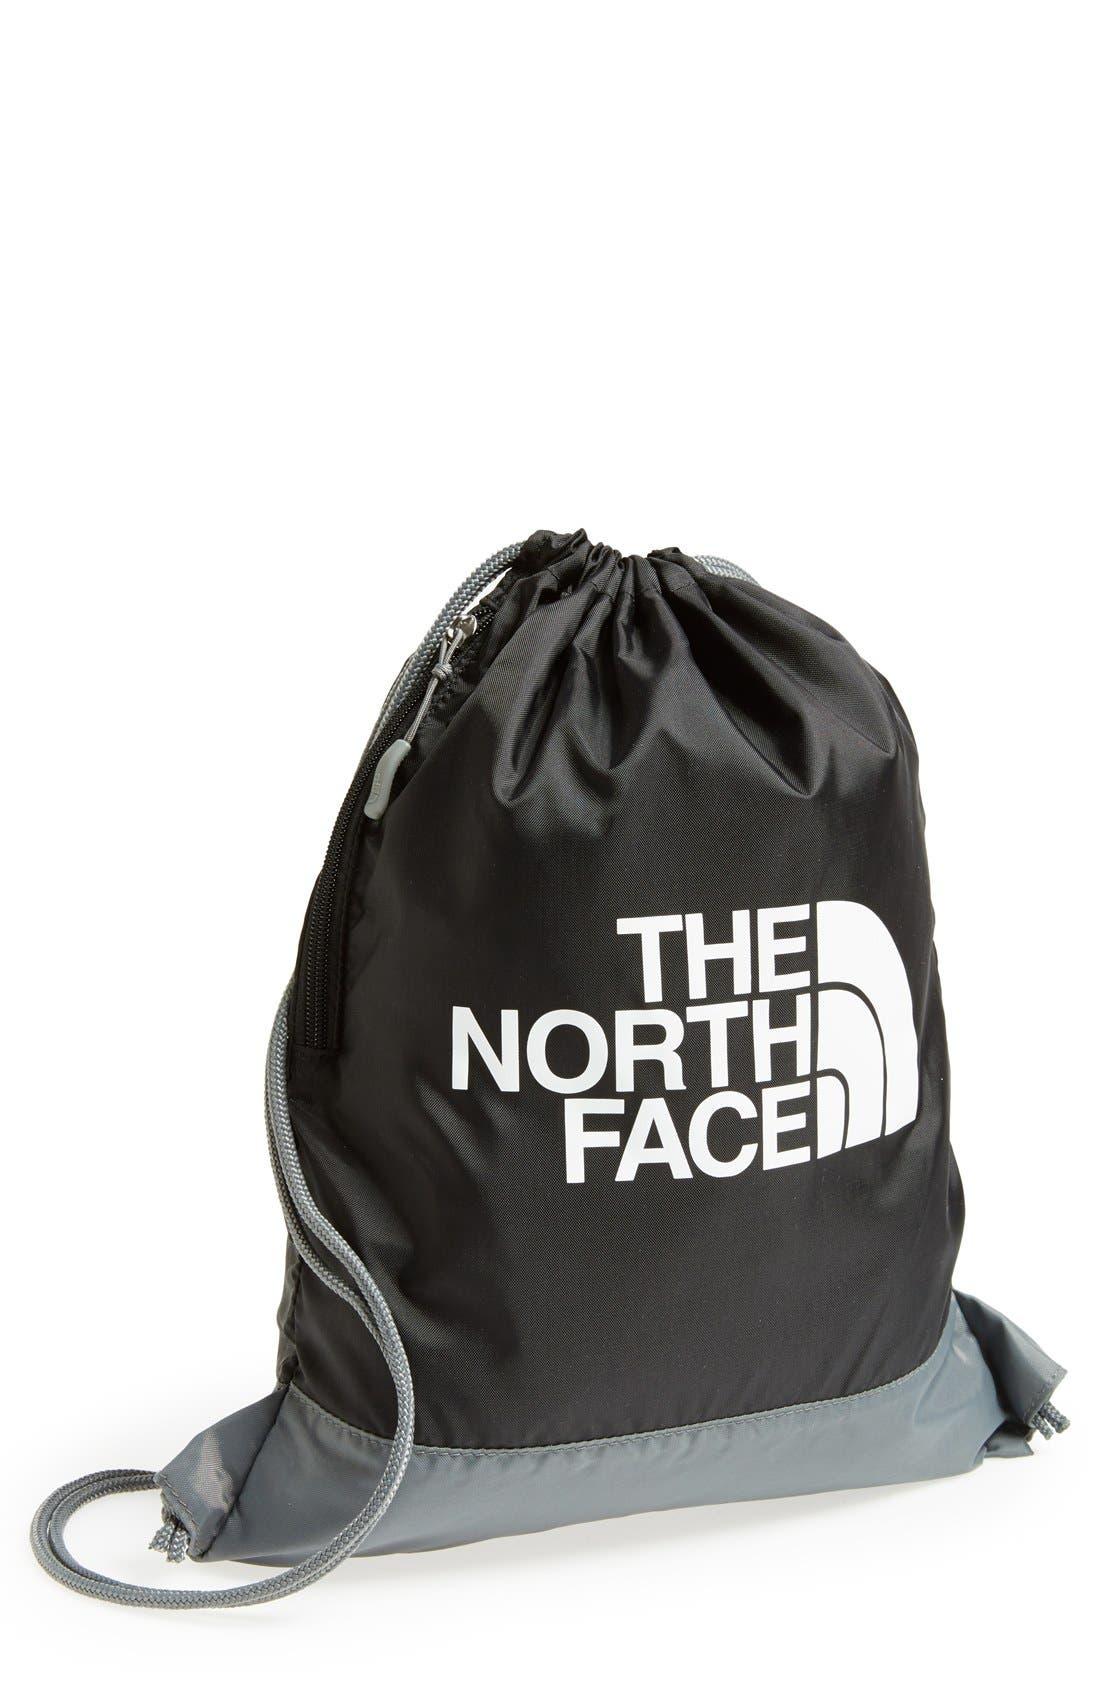 Alternate Image 1 Selected - The North Face 'Sack Pack' Drawstring Bag